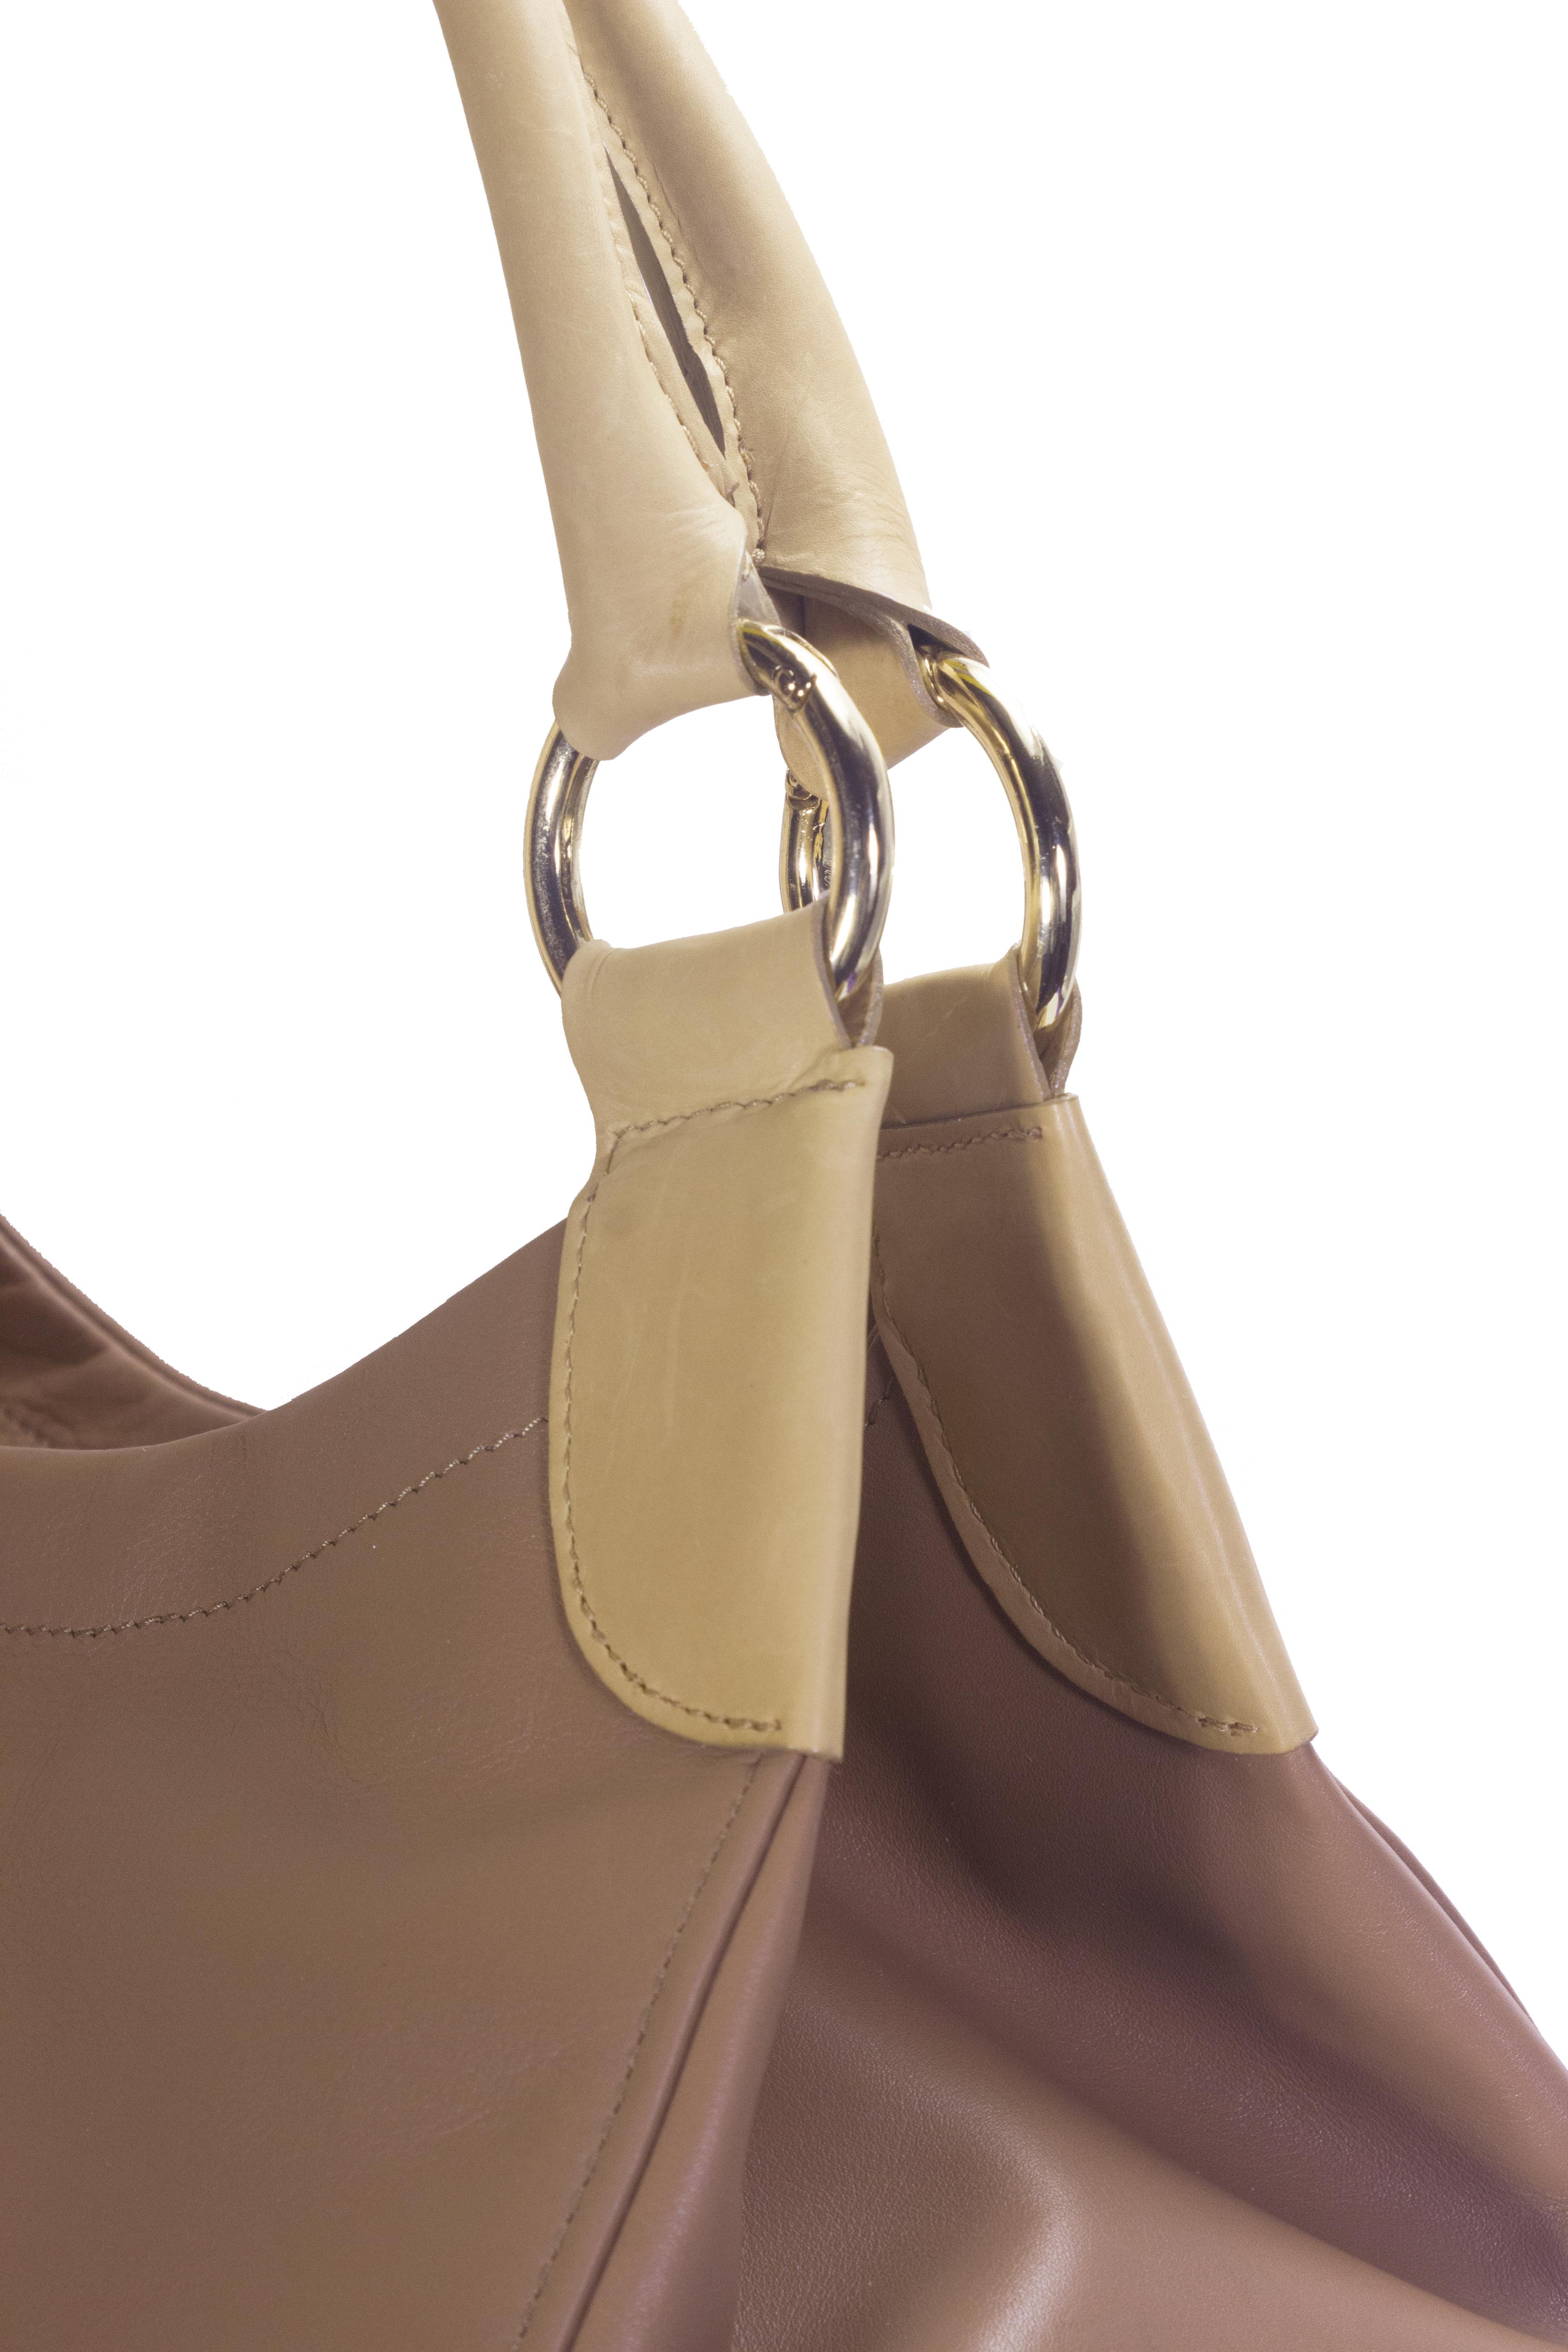 Hnědá kožená kabelka s béžovými detaily 11-DS260-lt.brown - detail